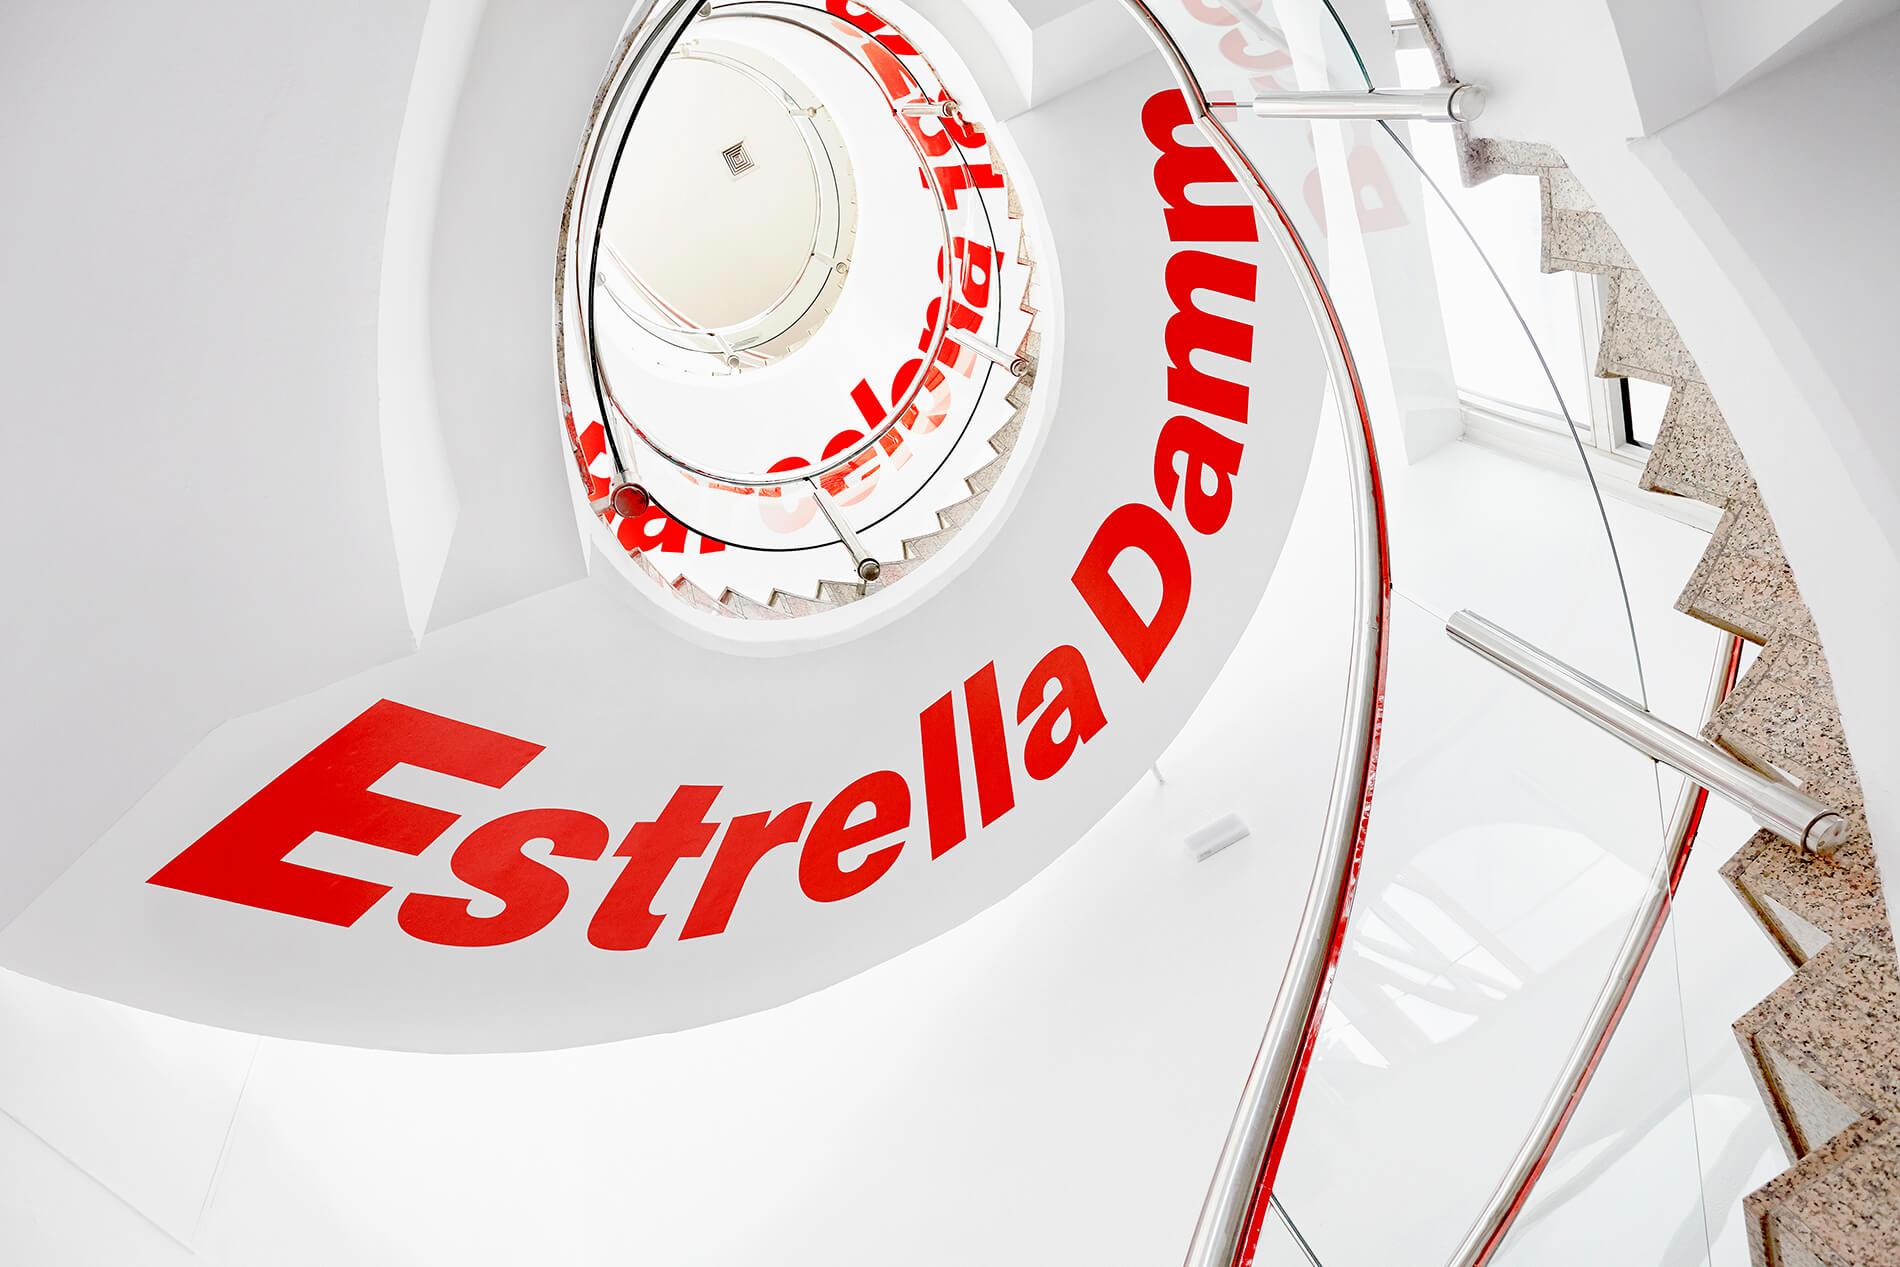 Estrella Damm Brewery - Selected - 2016